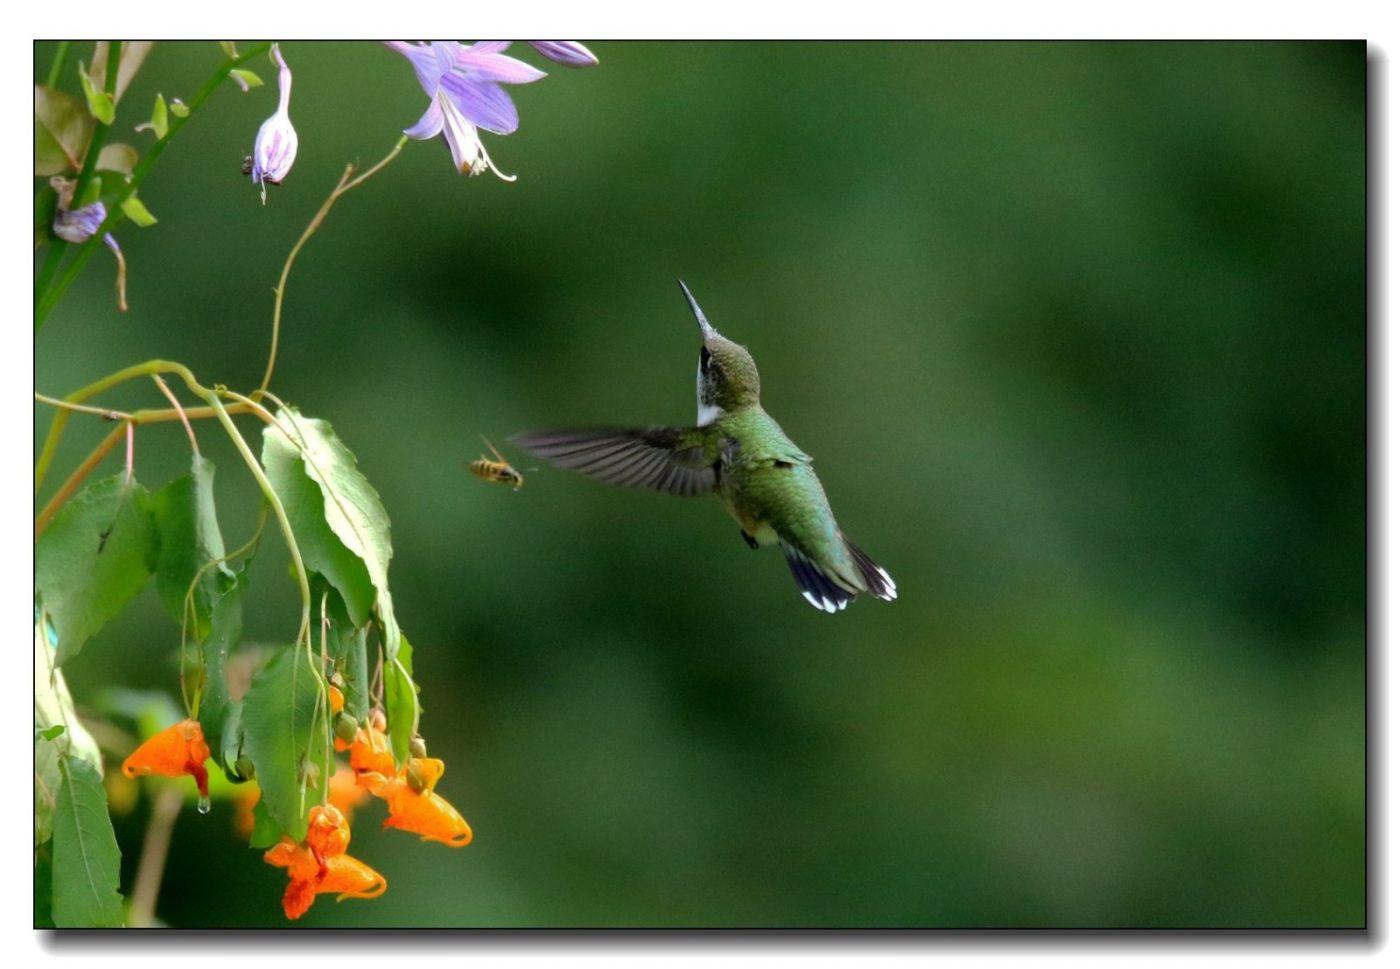 蜂鸟组图(一)_图1-5